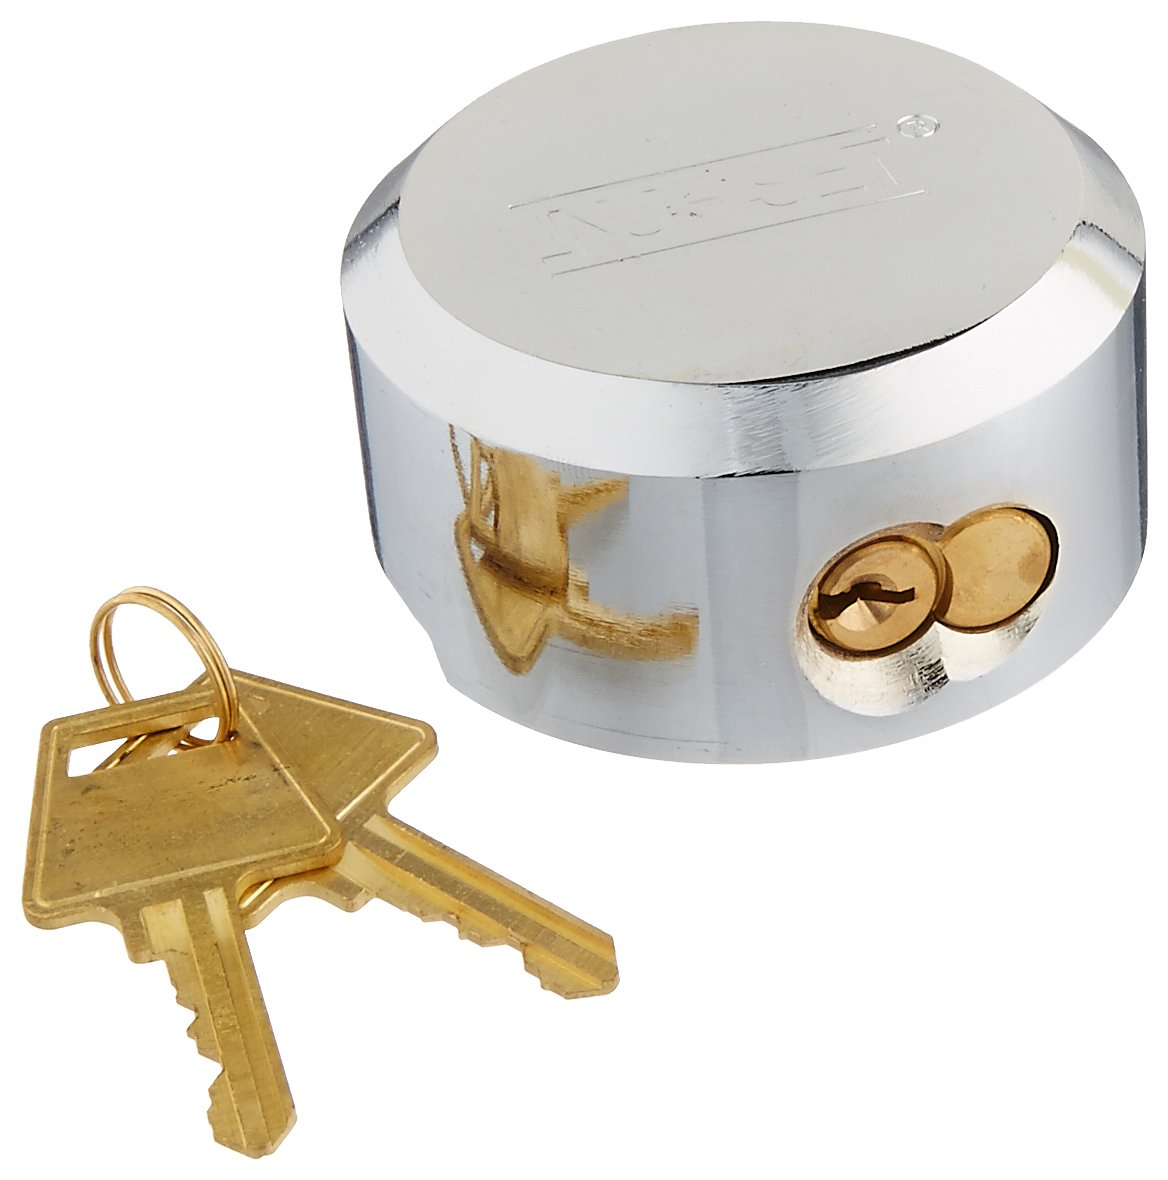 NU-SET 5373-3 Hidden Shackle Padlock with Hockey Puck Lock, Solid Steel